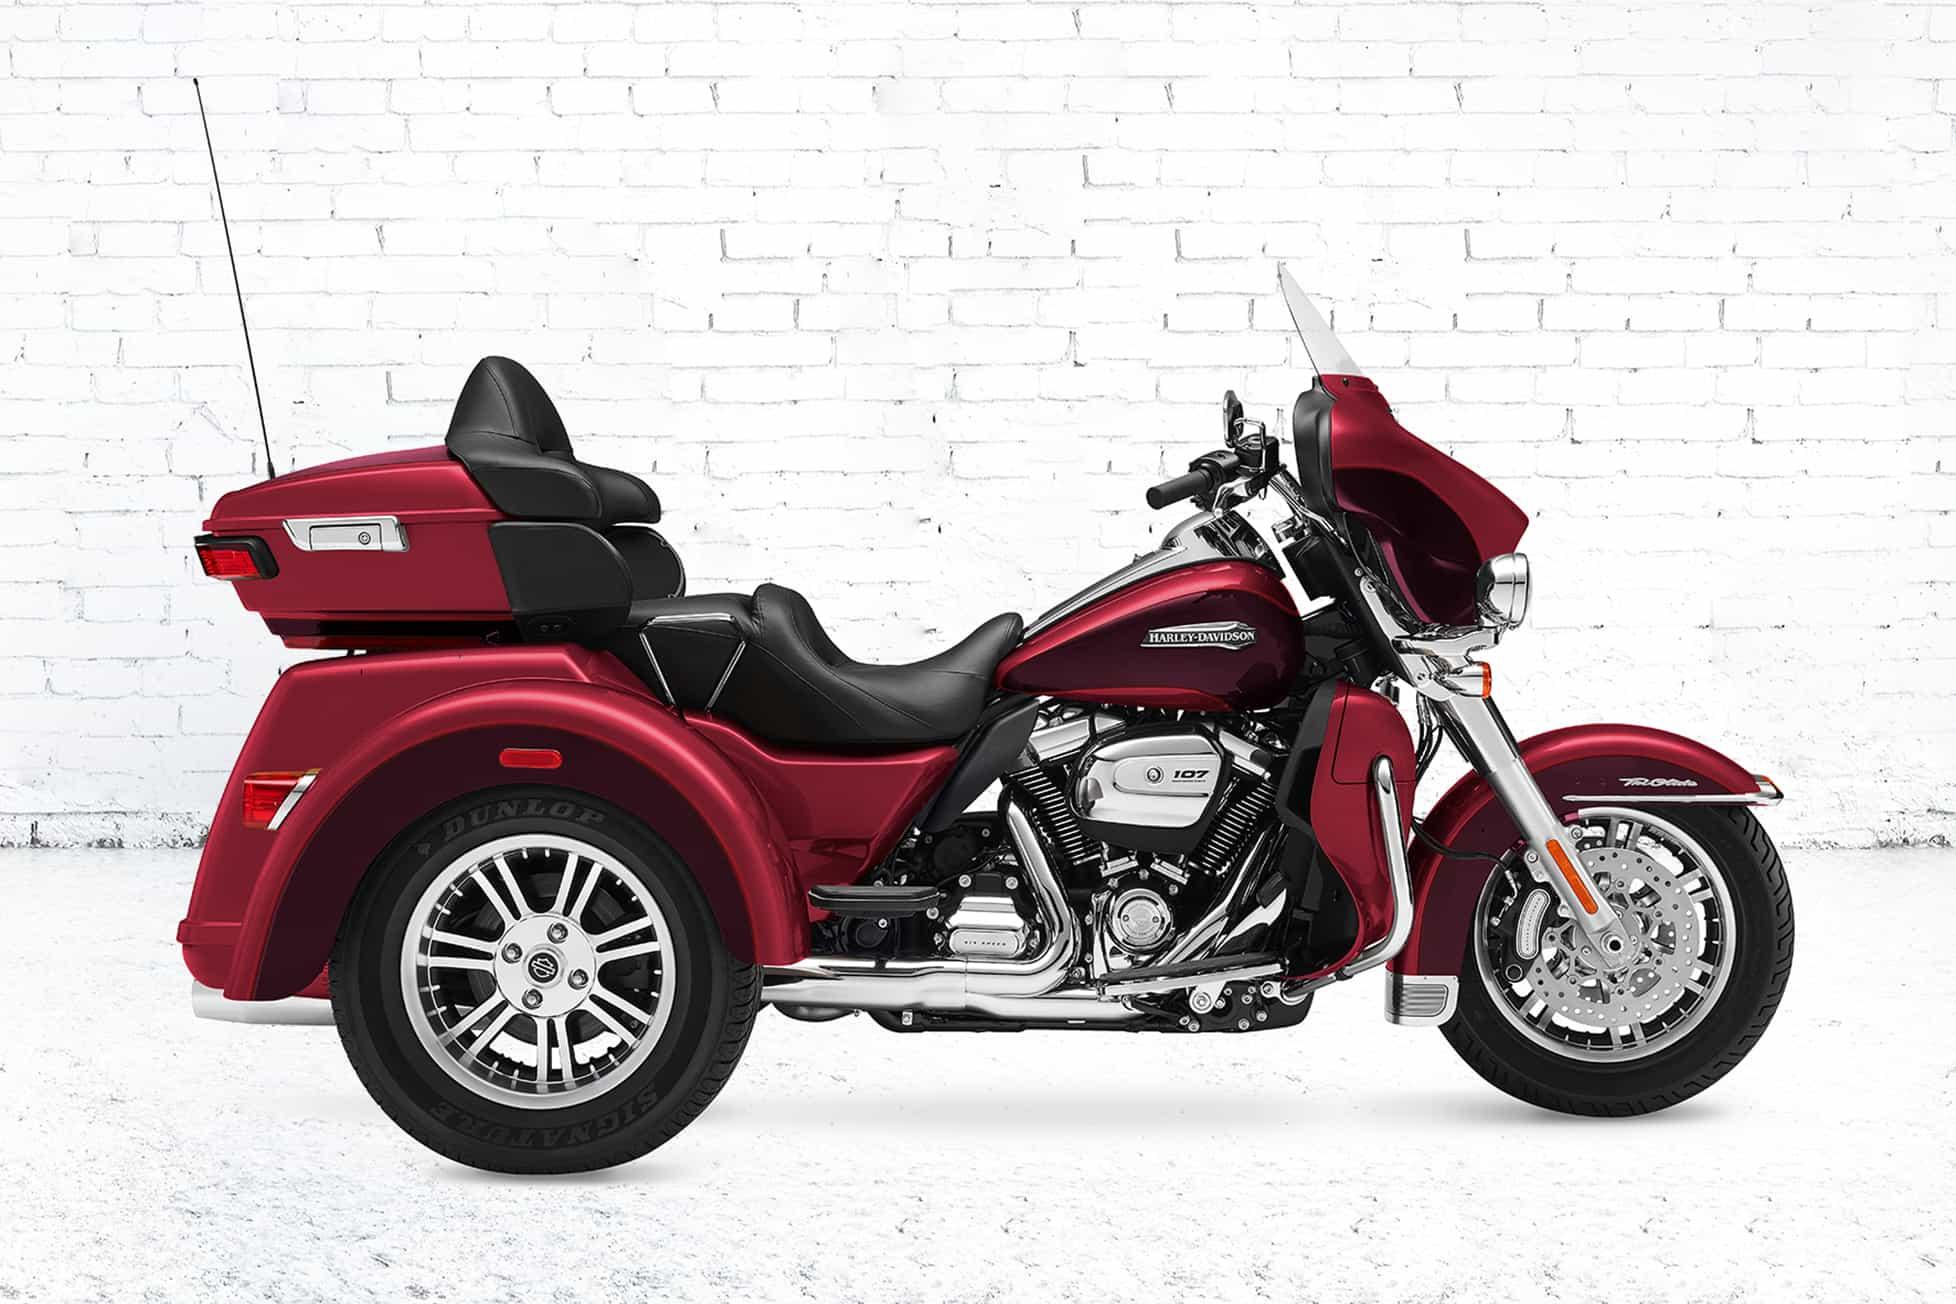 2018 trike tri glide ultra specs pricing harley davidson usa rh harley  davidson com 2005 Harley-Davidson Ultra Glide Classic Battery for 2005 Ultra  Classic